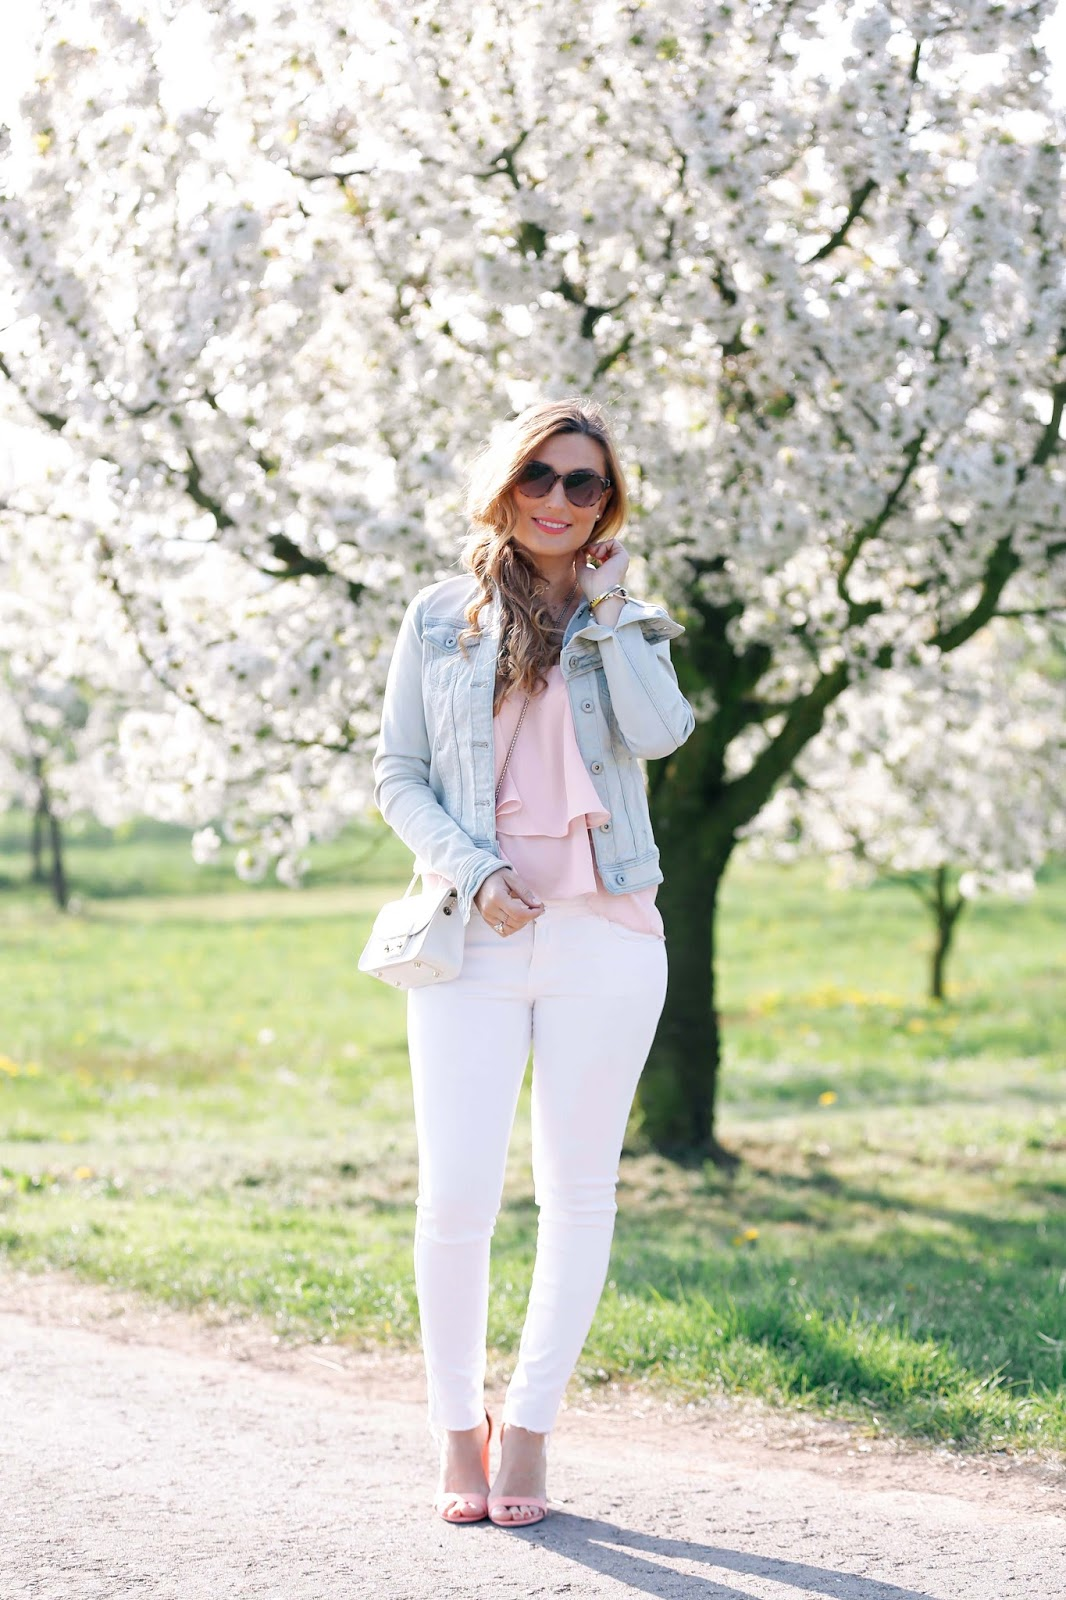 blogger-style-weiße-jeans-rosa-sandalen-blogger-sommerlook